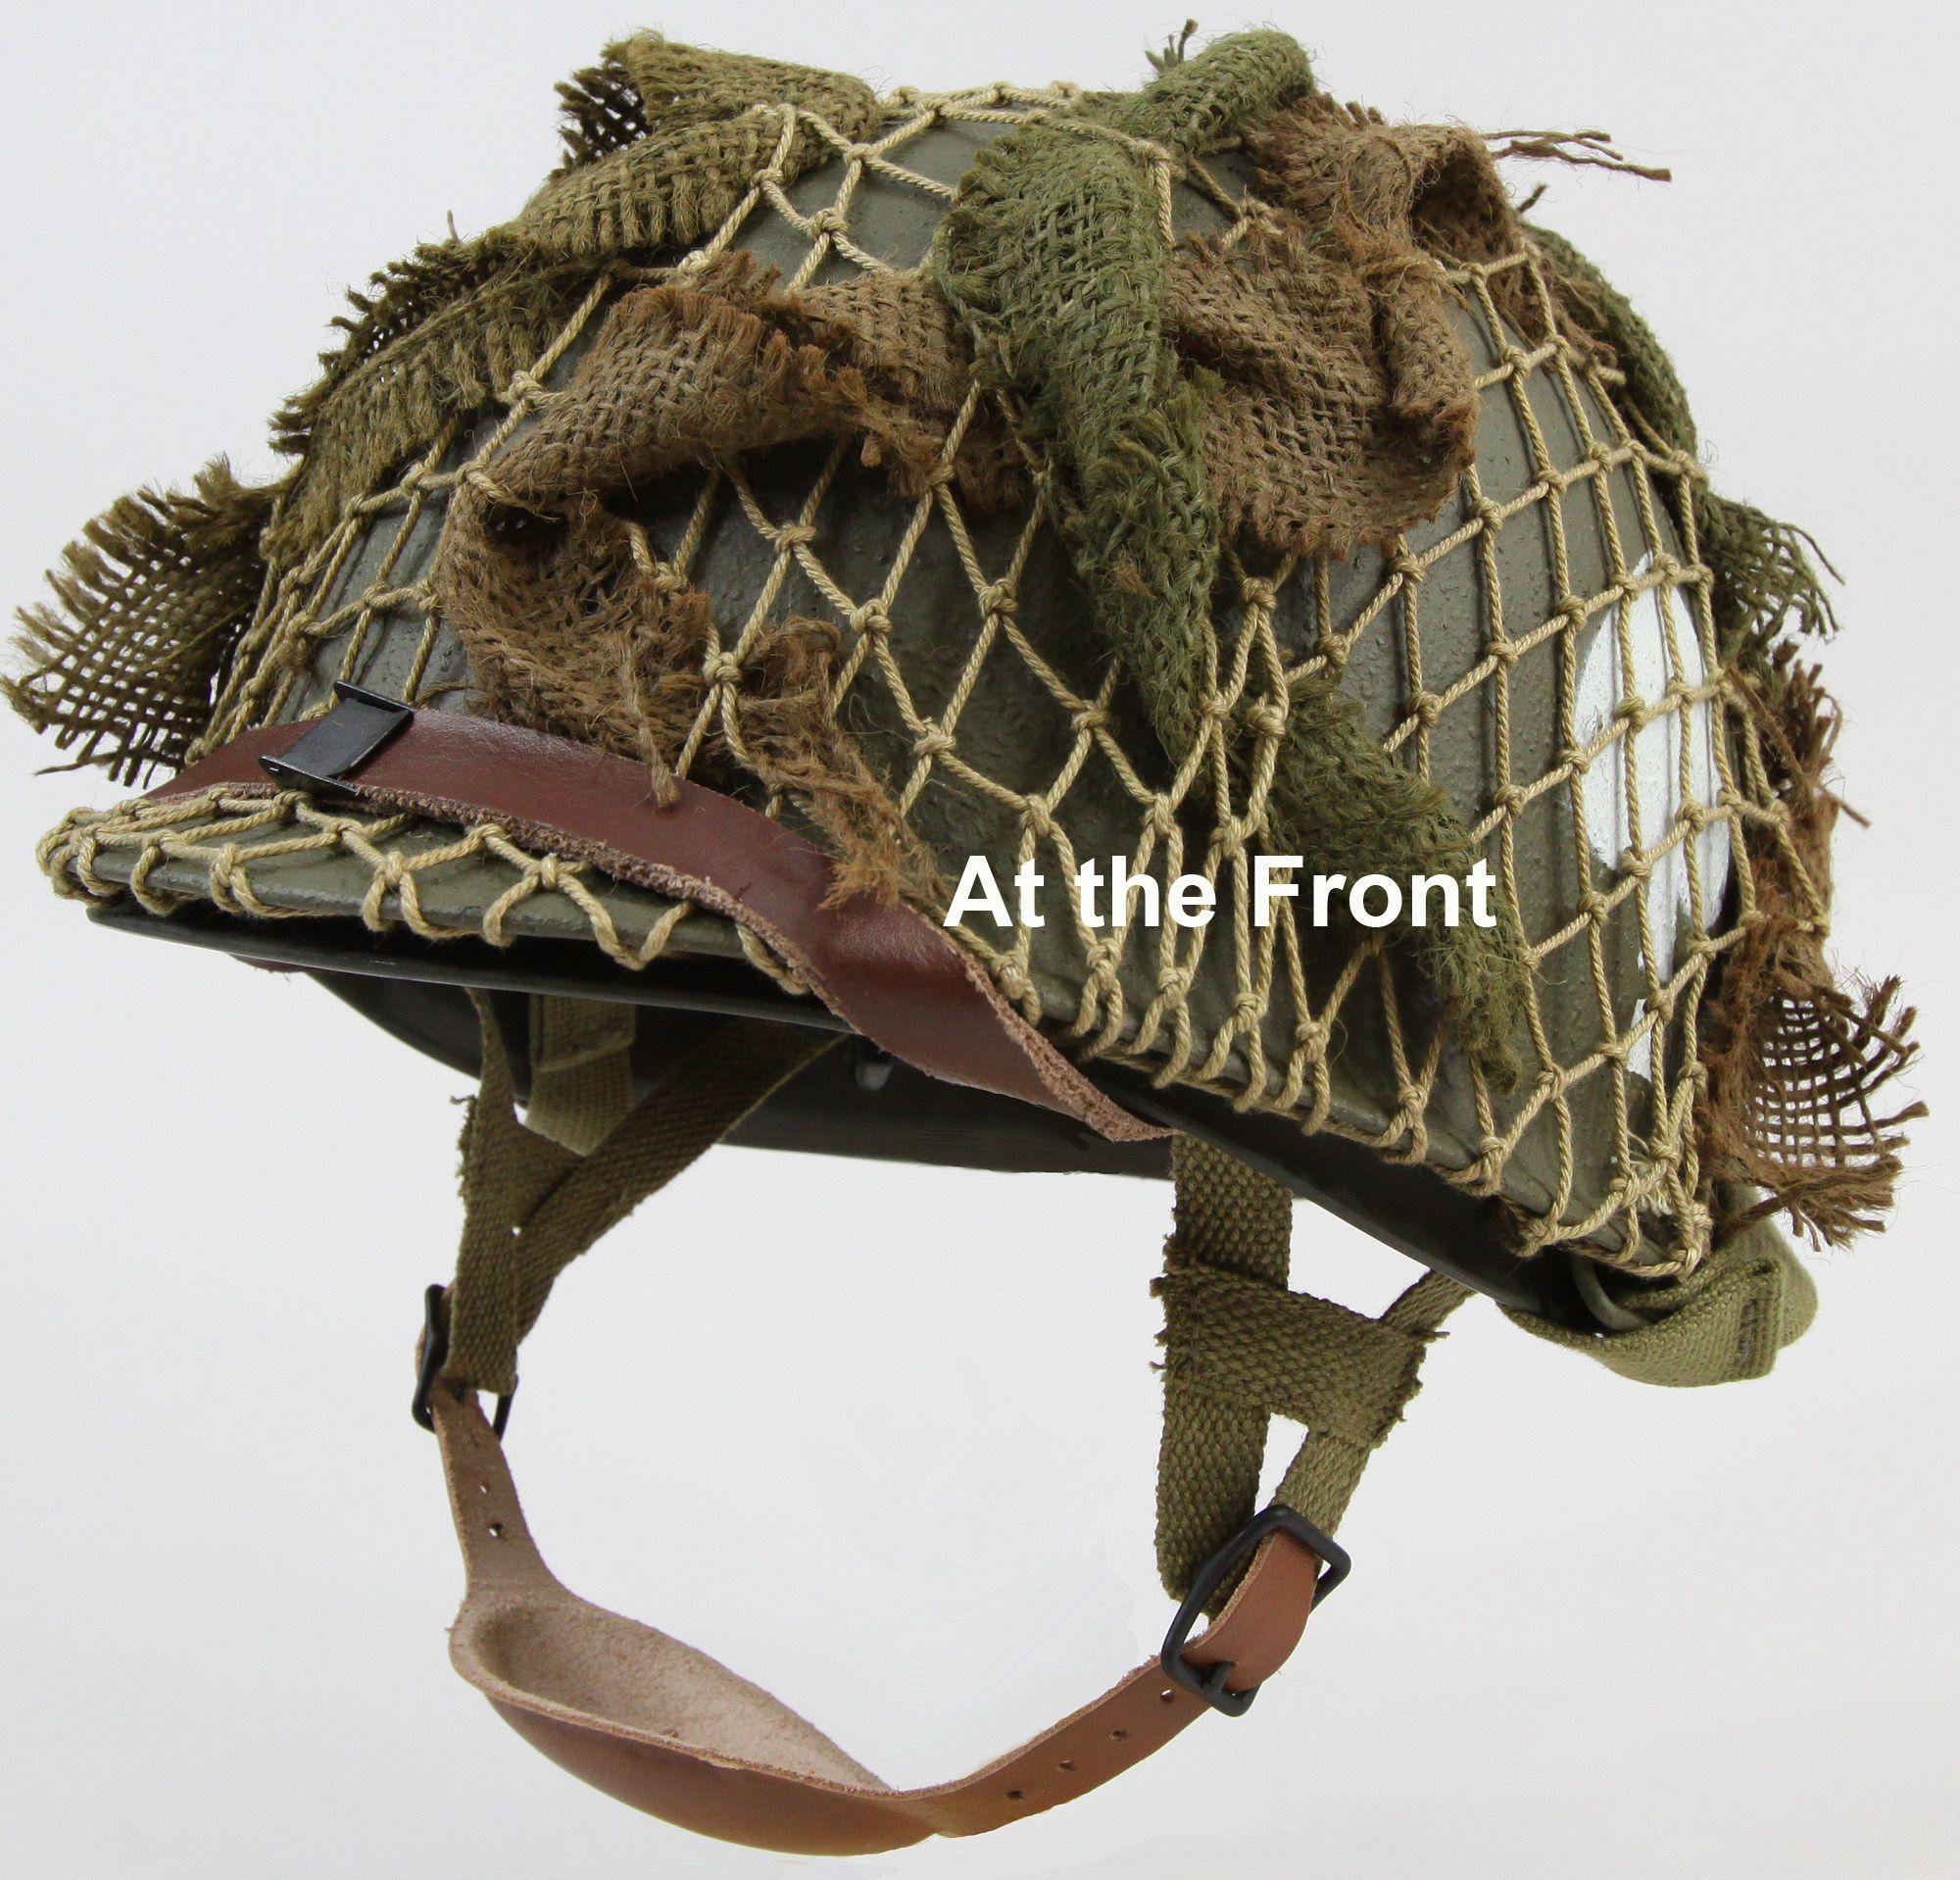 Reproduction 506th Paratrooper Helmet | War History | Army helmet